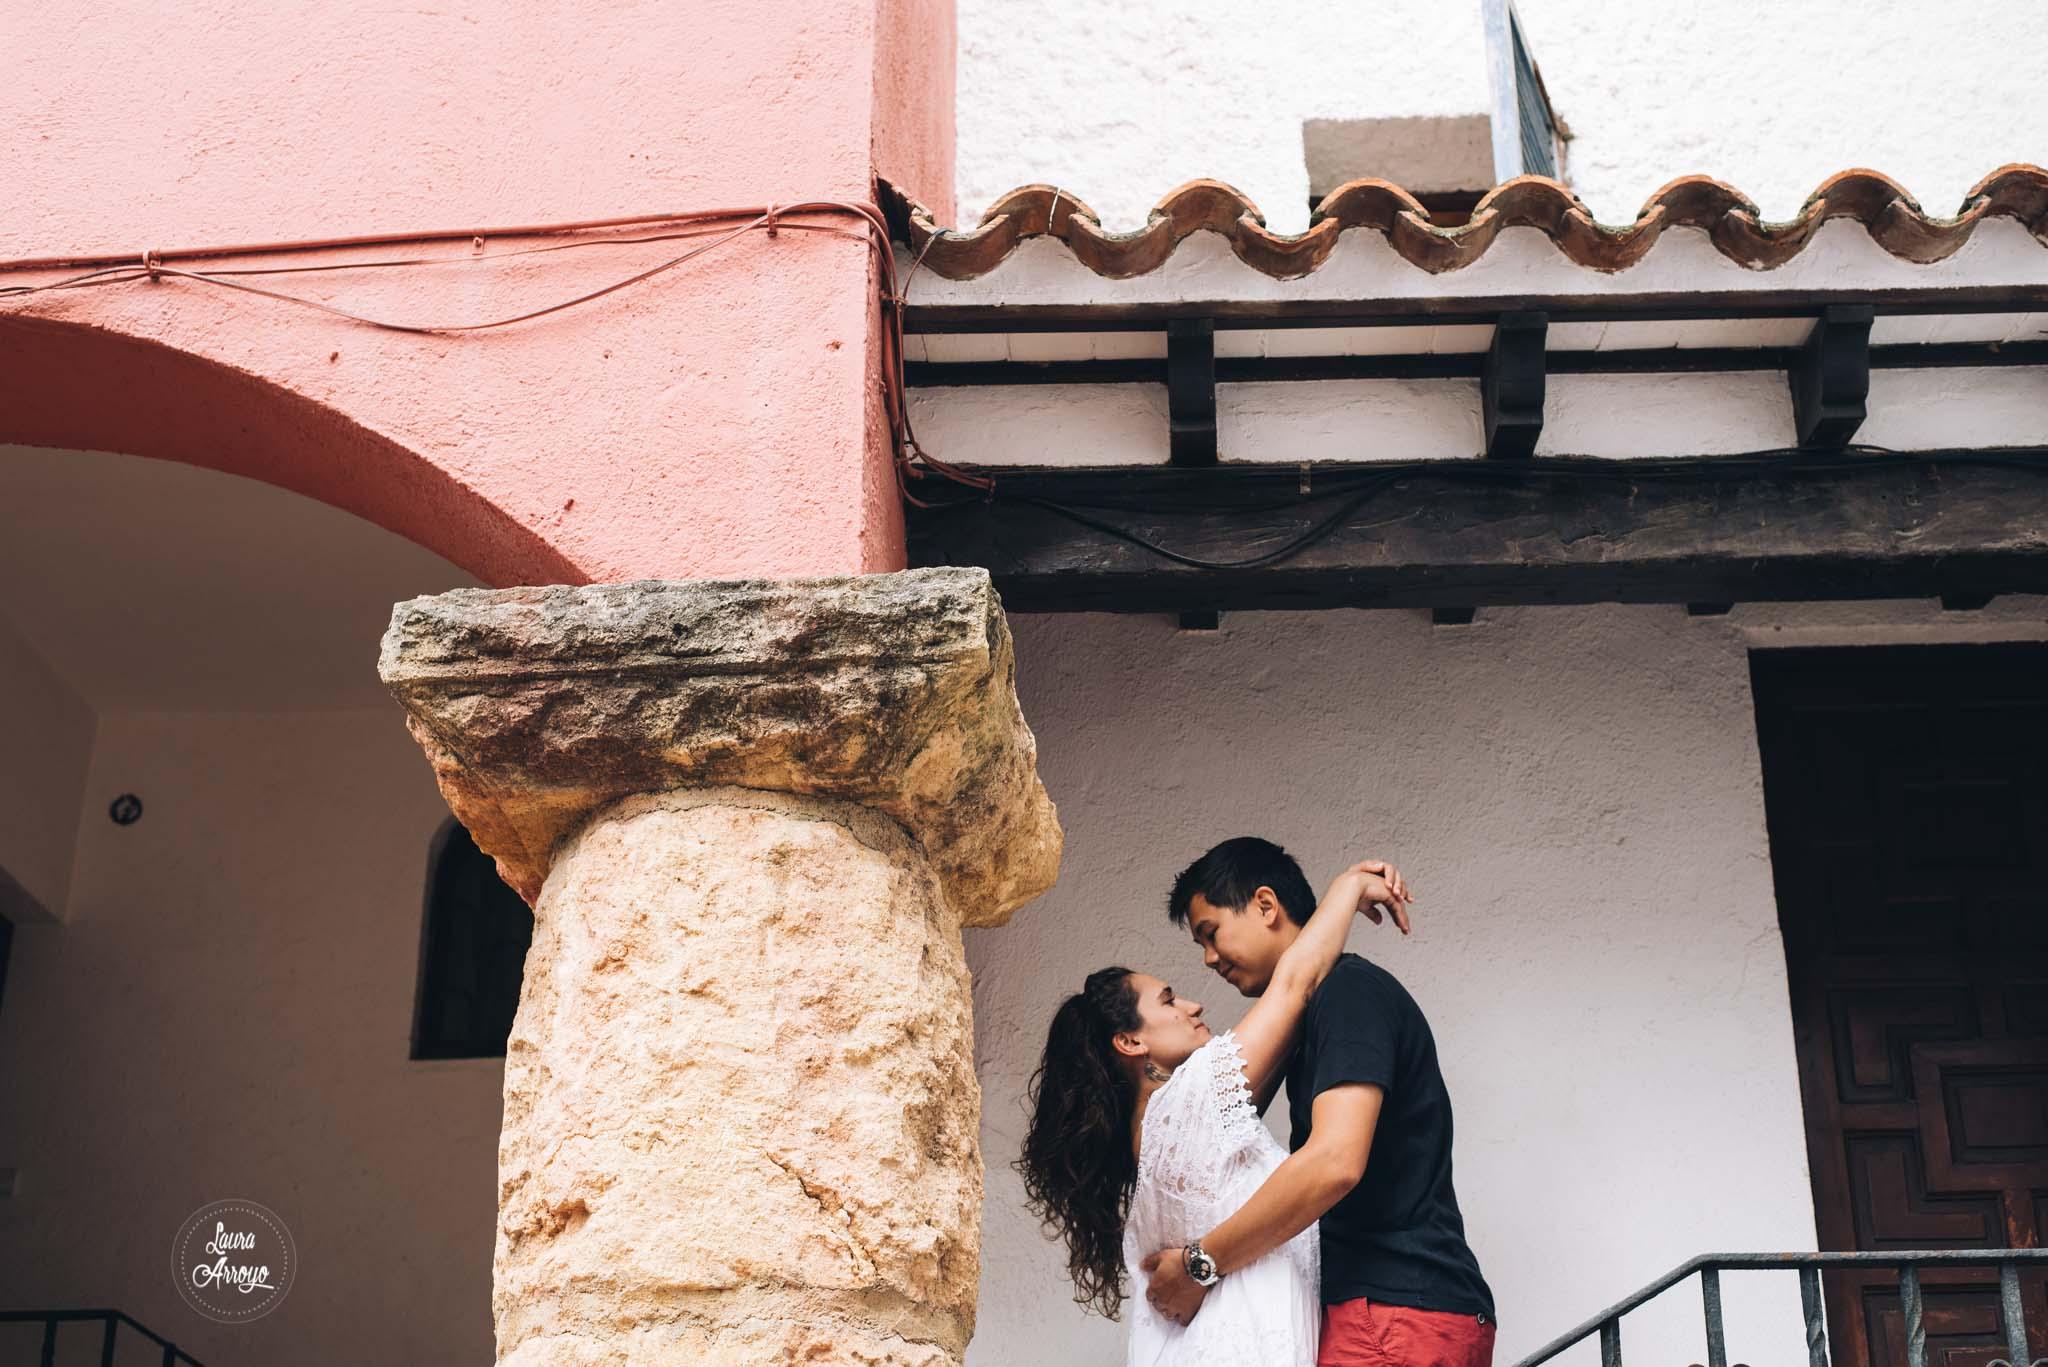 Laura_Arroyo_preboda_-Roc de Sant Gaieta - Tarragona-Fotoperiodismo_de_boda_8636